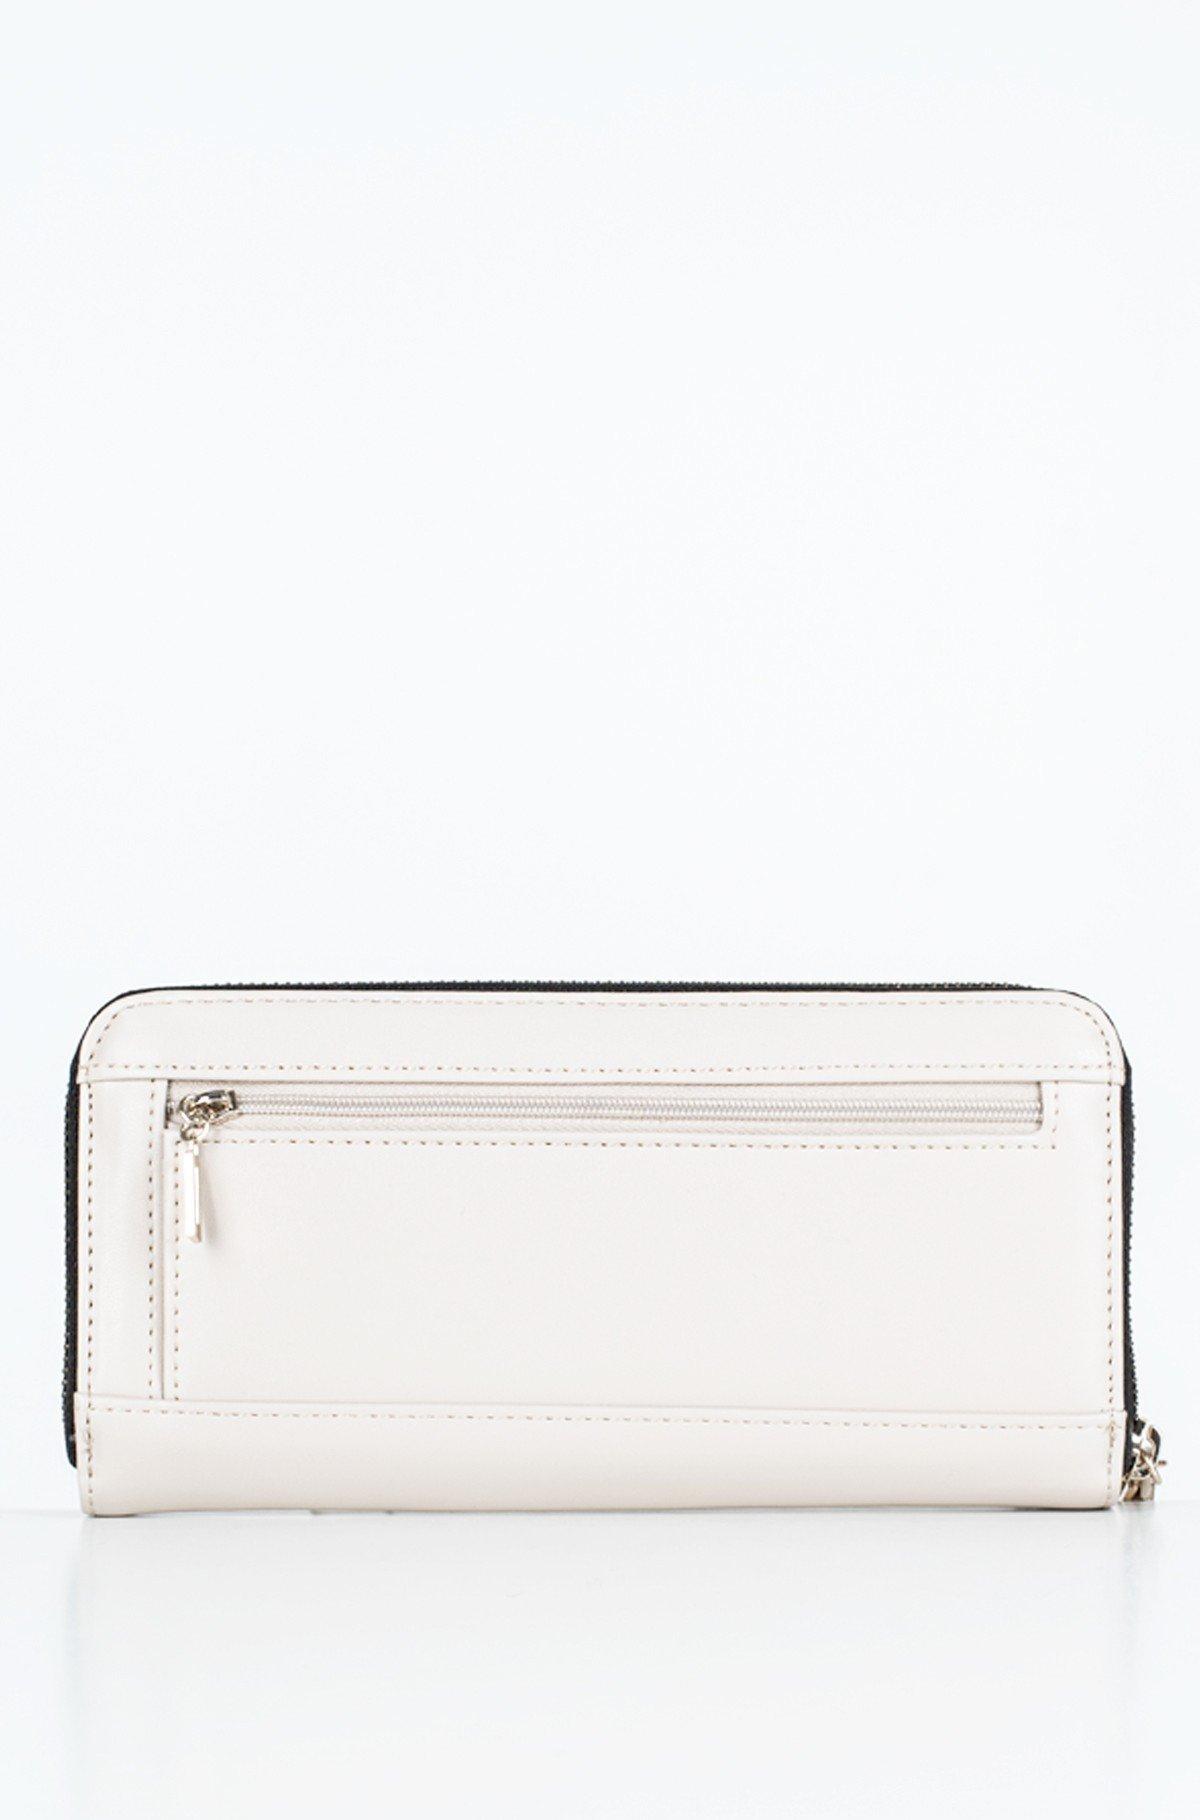 Wallet SWVG78 80460-full-3